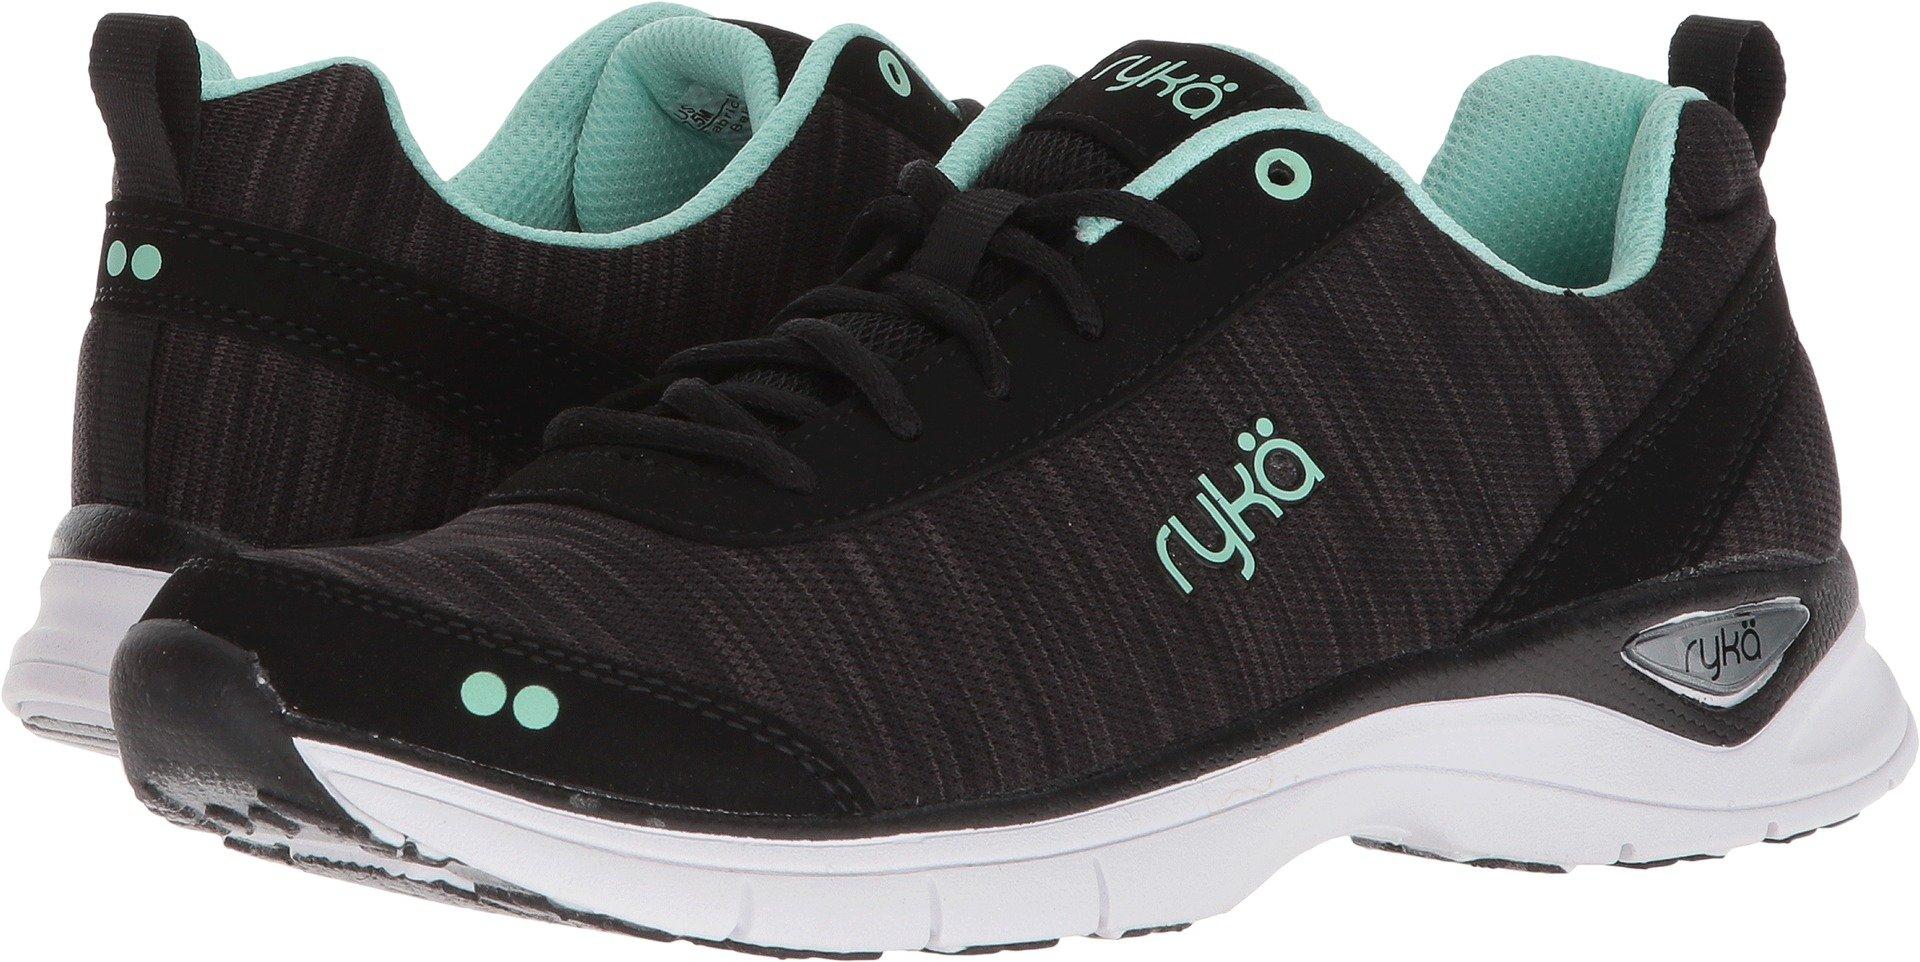 Ryka Women's Rayne Walking Shoe, Black/Mint, 8 M US